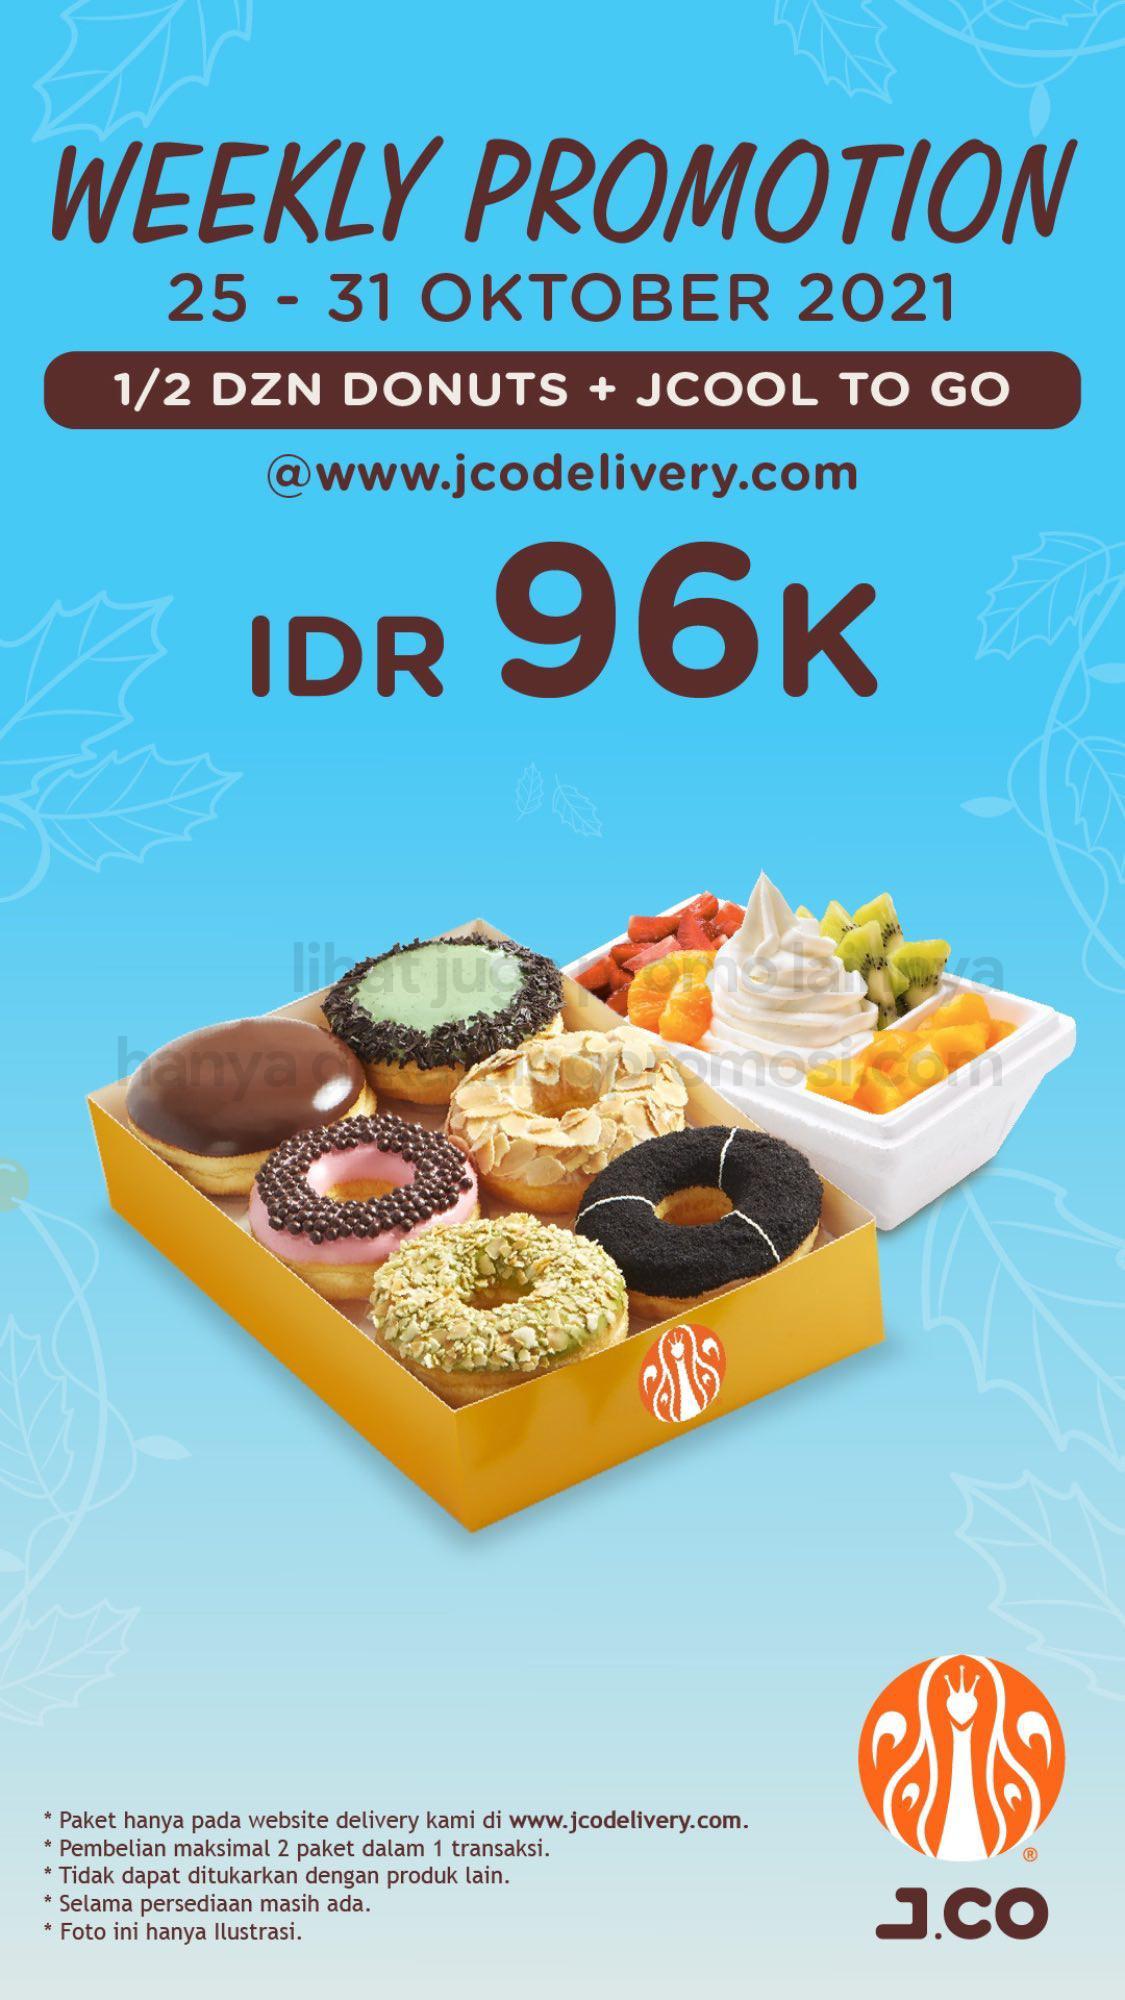 Promo JCO Minggu Ini | Weekly Promotion - 1/2 lusin JCO DONUTS + JCOOL TO GO hanya Rp 96.000*